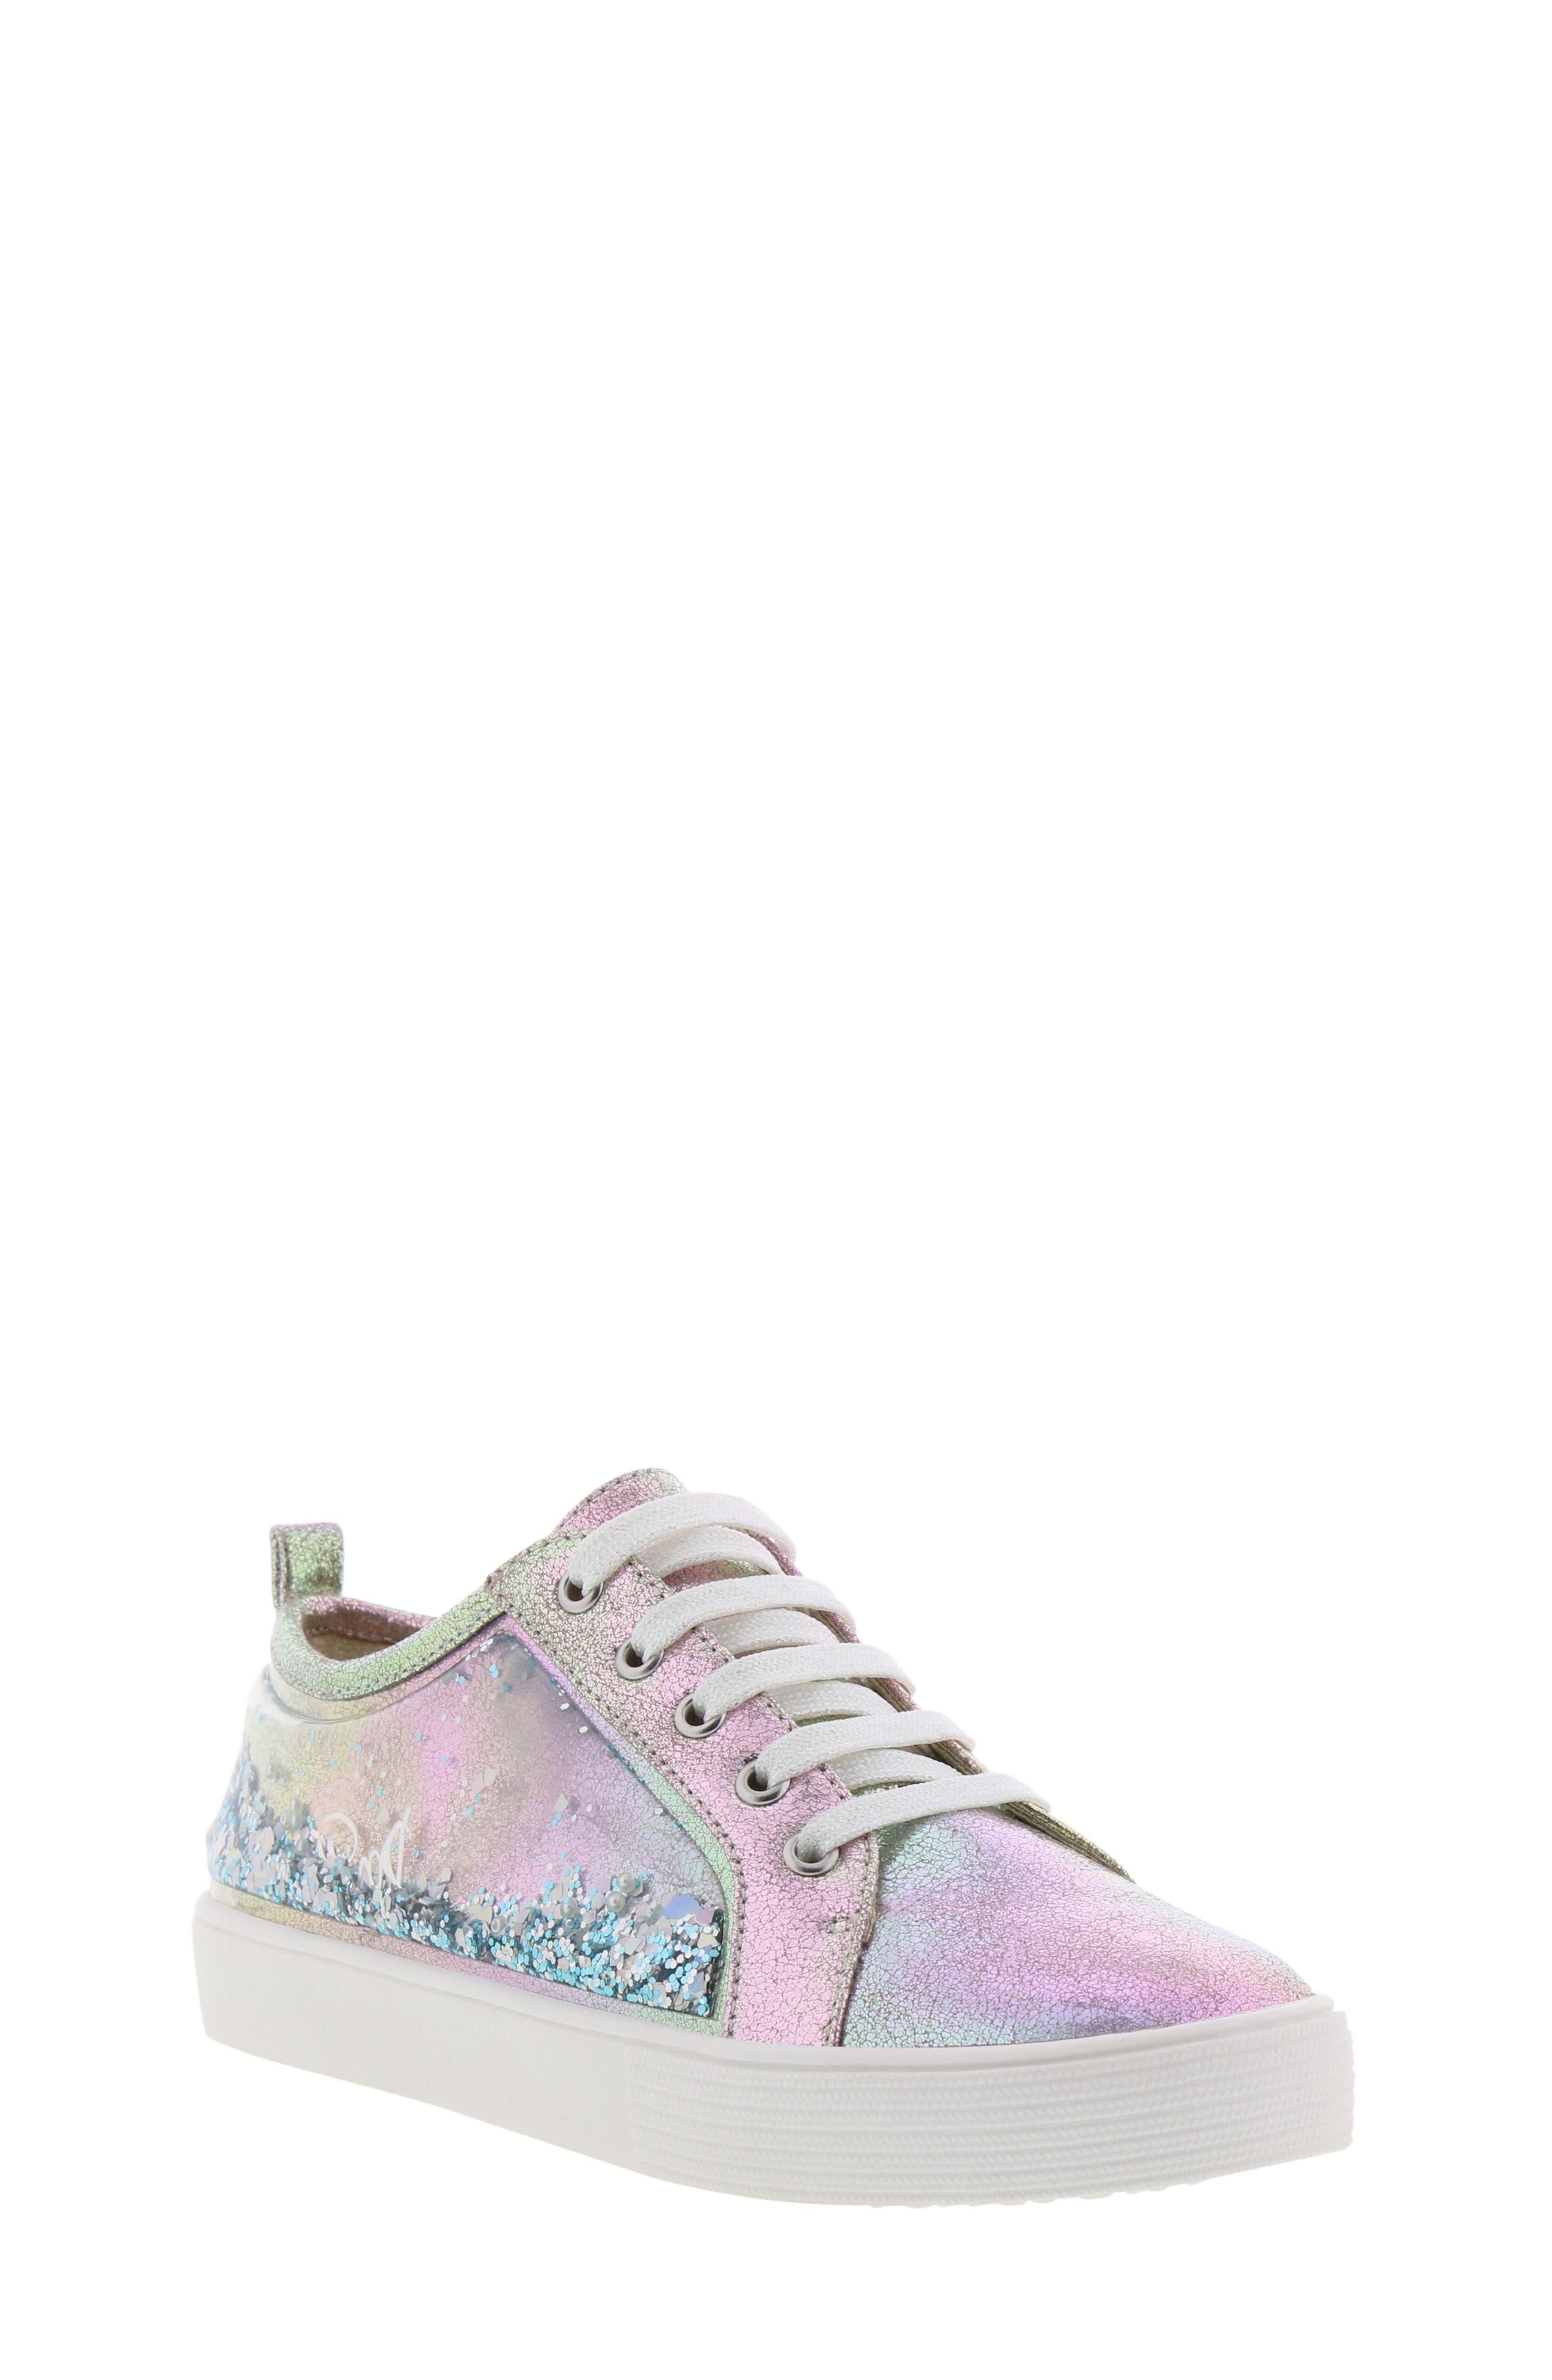 Bella Aqua Slip-On Sneaker,                             Main thumbnail 1, color,                             GASOLINE IRIDESCENT